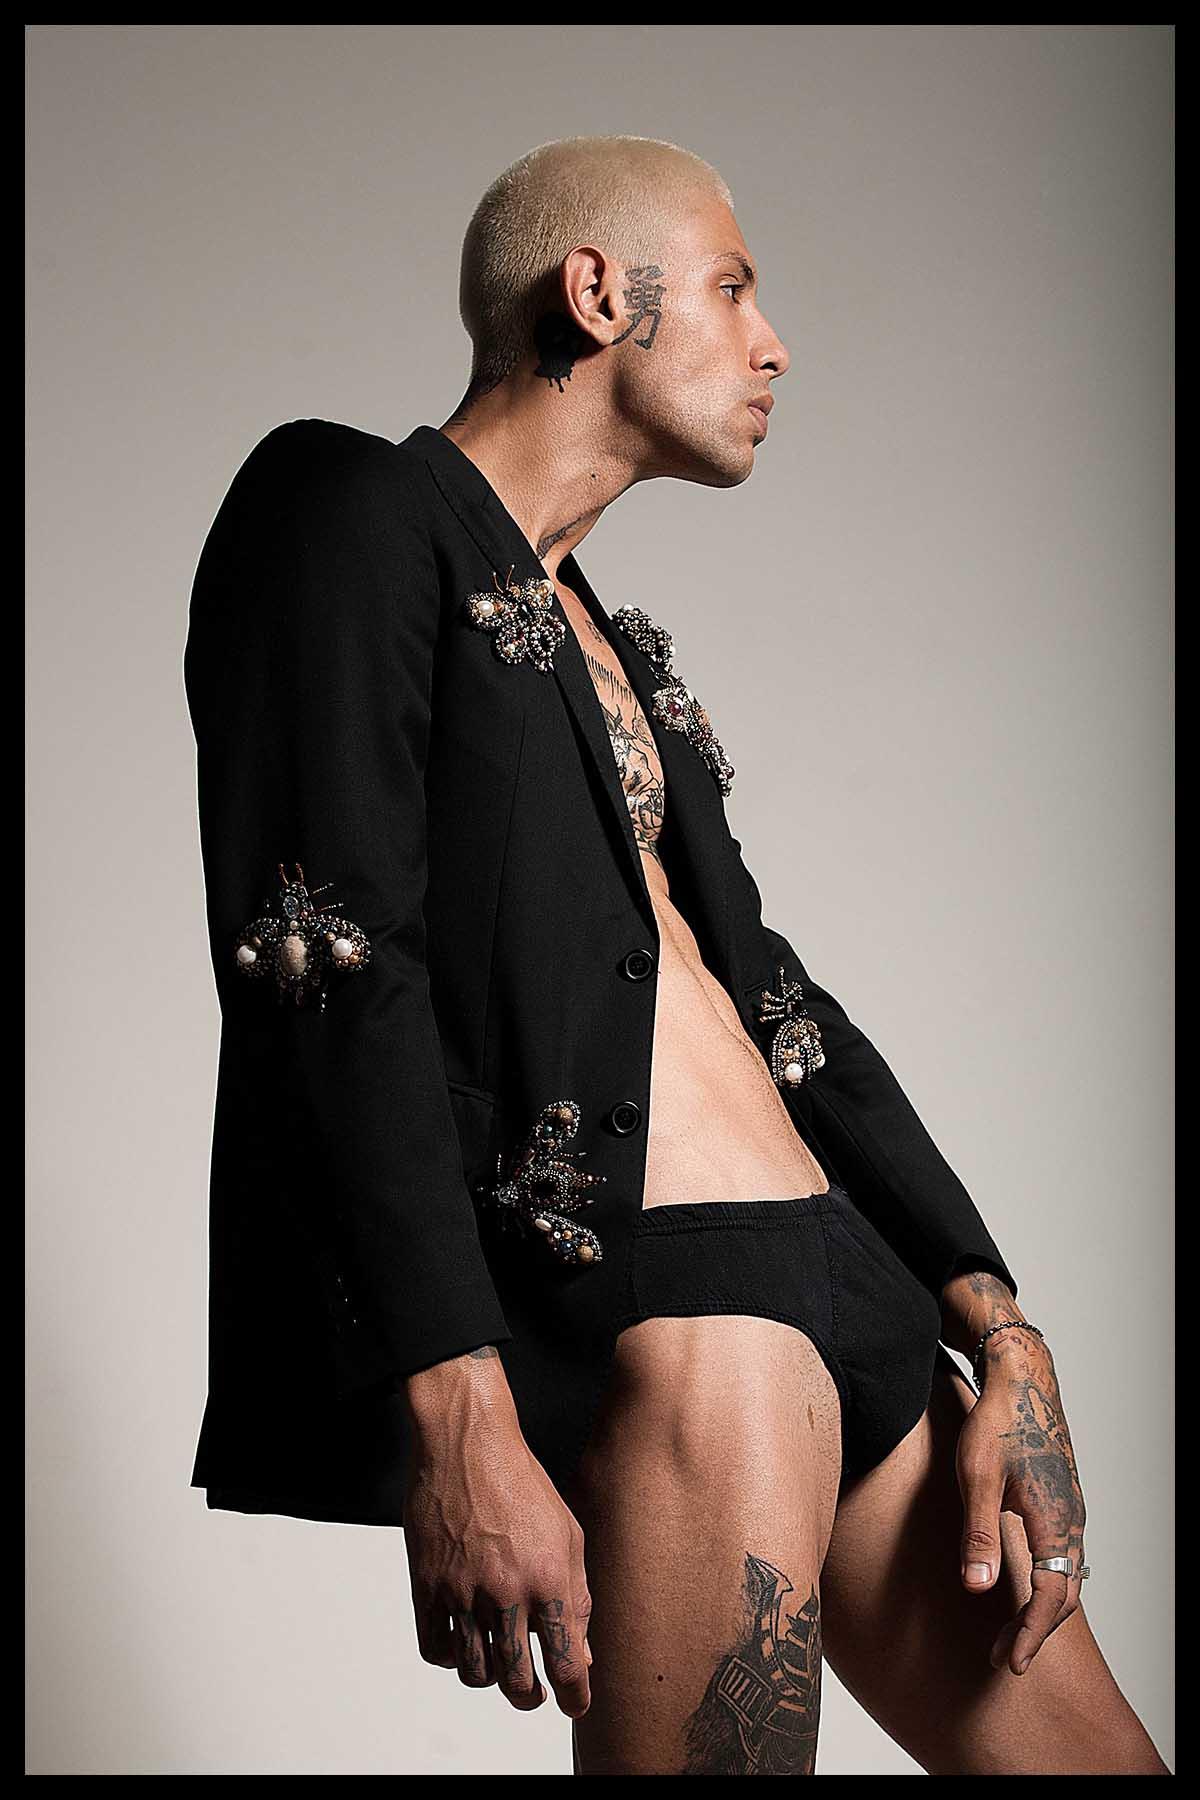 Daniel Janinni by Rodrigo Moura for Brazilian Male Model